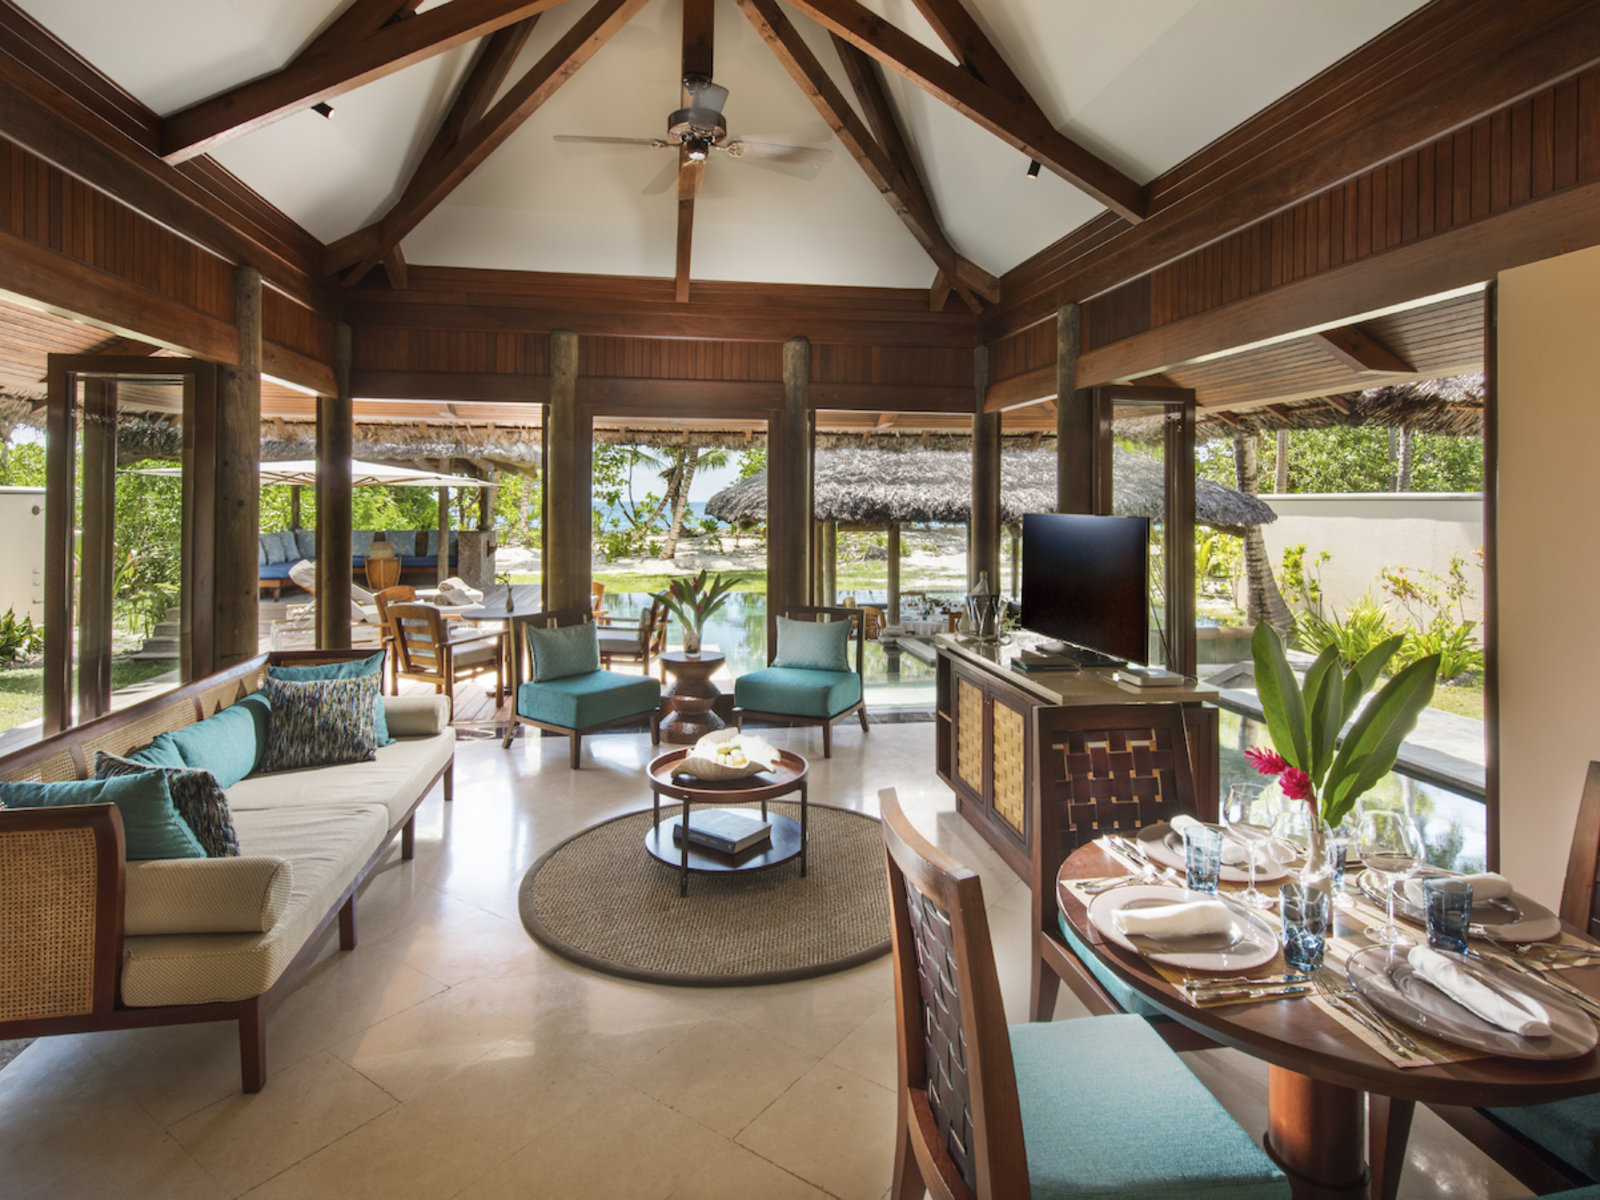 Wohnbeispiel Honeymoon/Anniversary Pool Villa (1 Bedroom)